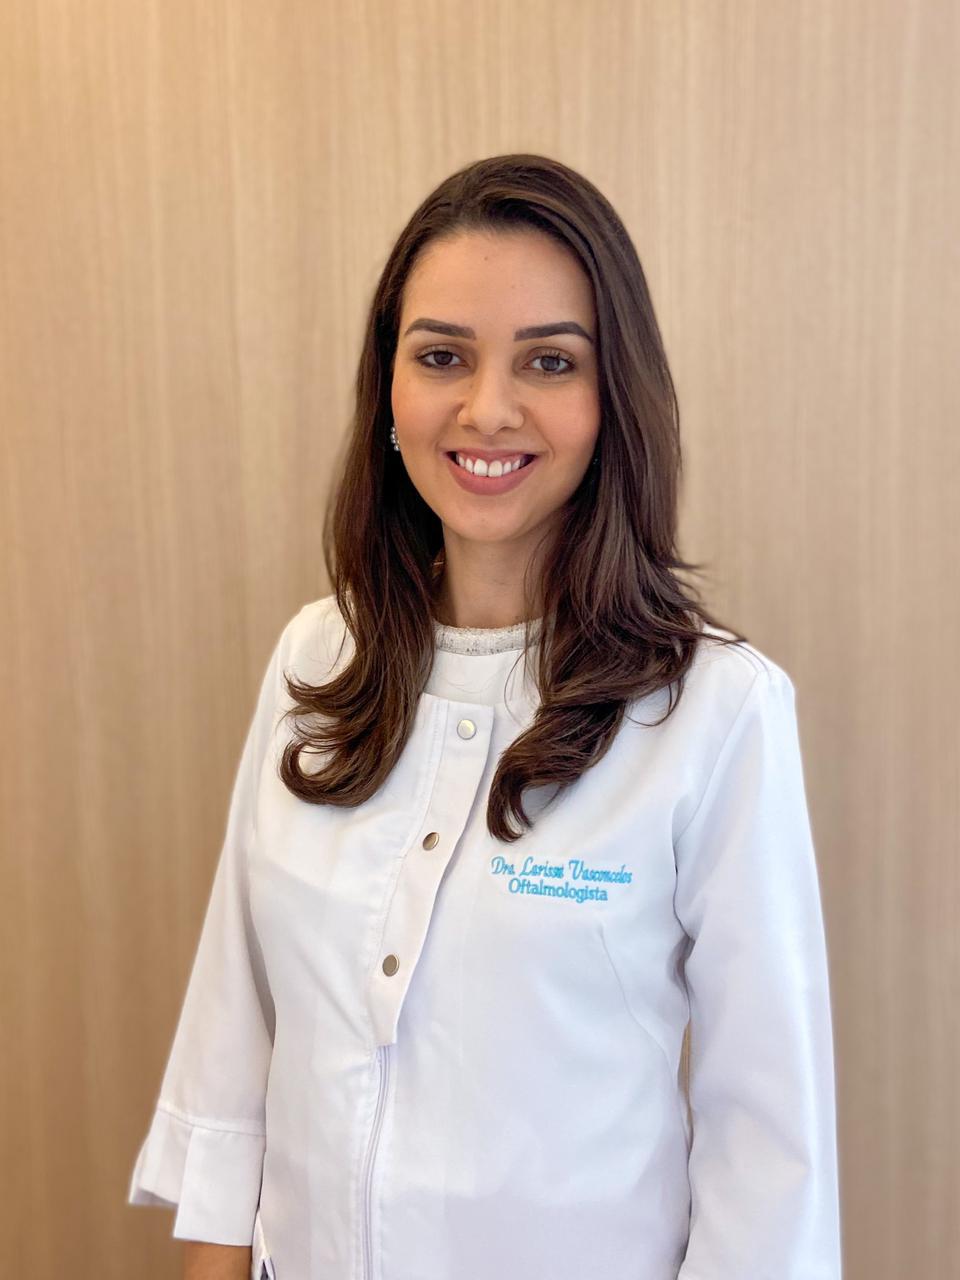 Dra. Larissa Gonçalves Vasconcelos